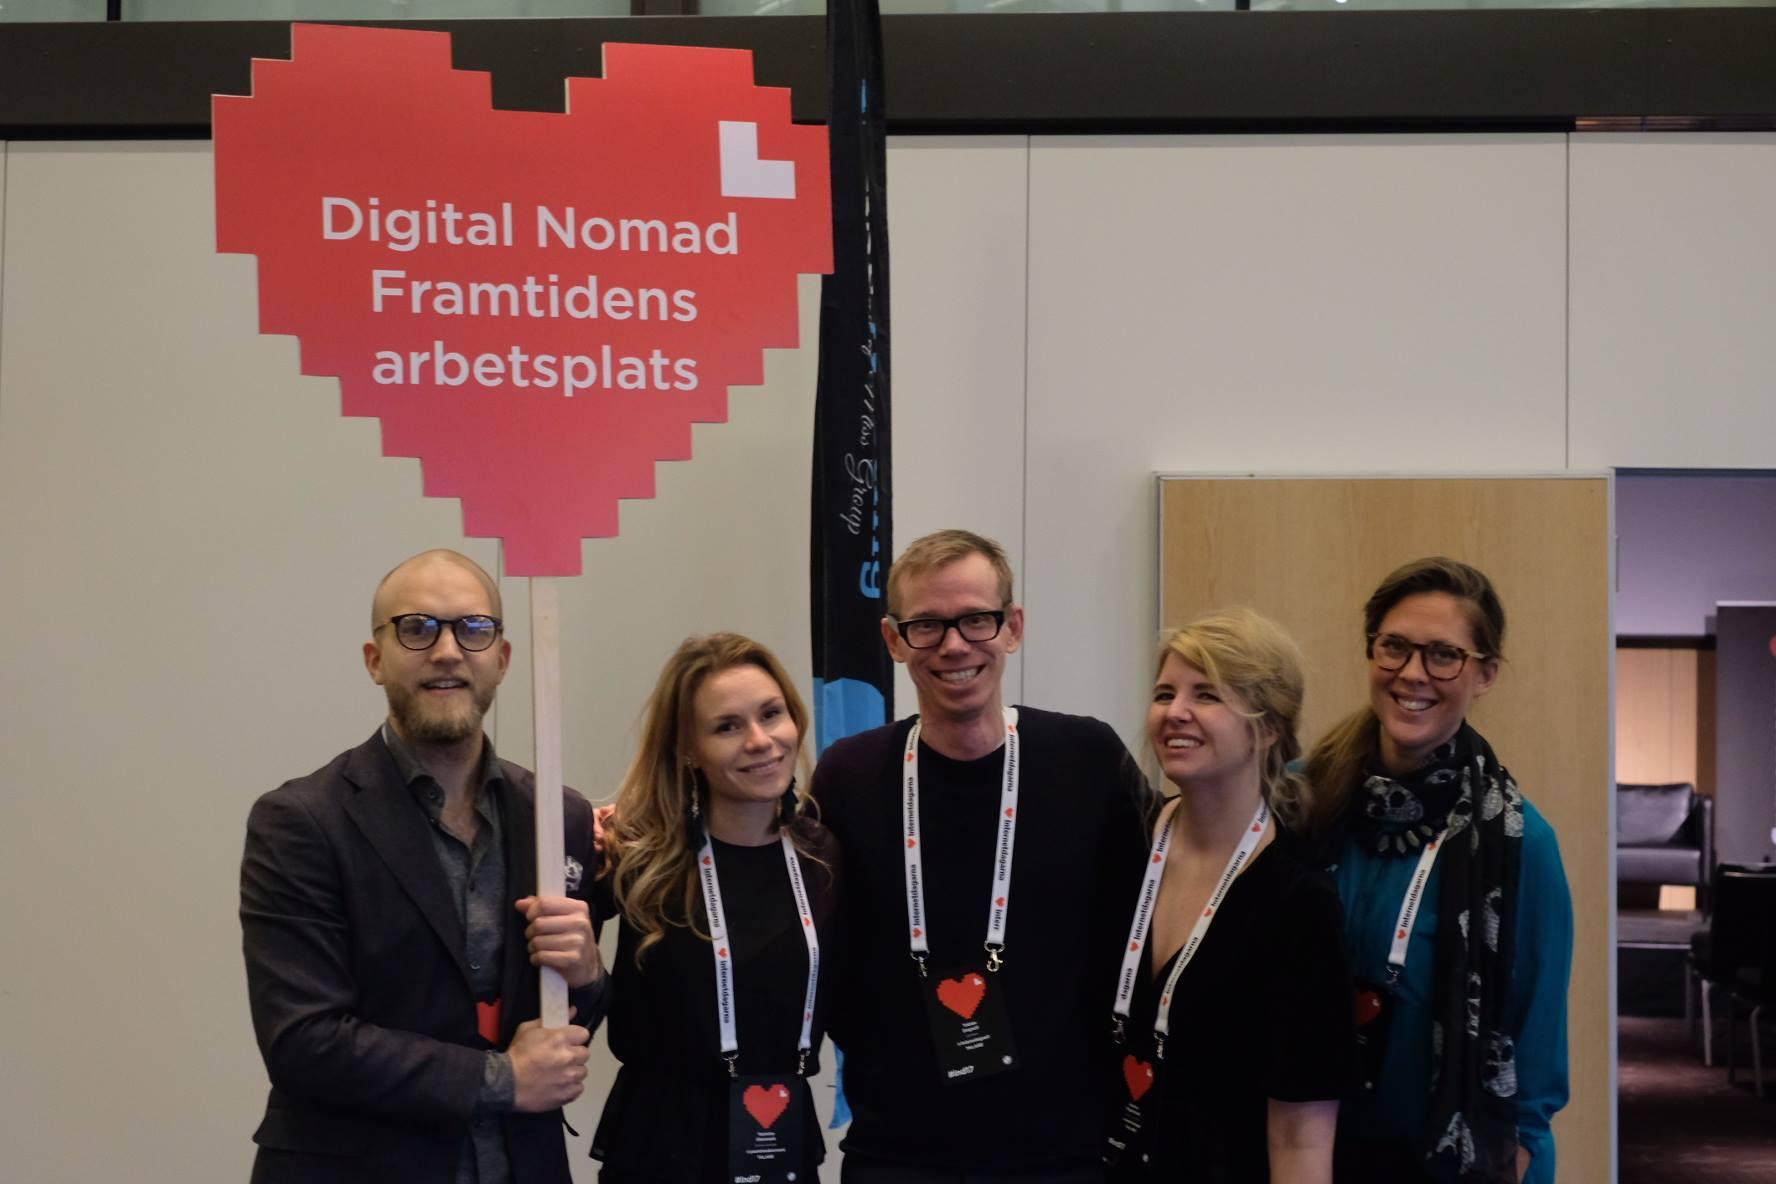 Internetdagarna 2017: Digital nomads and the future of work